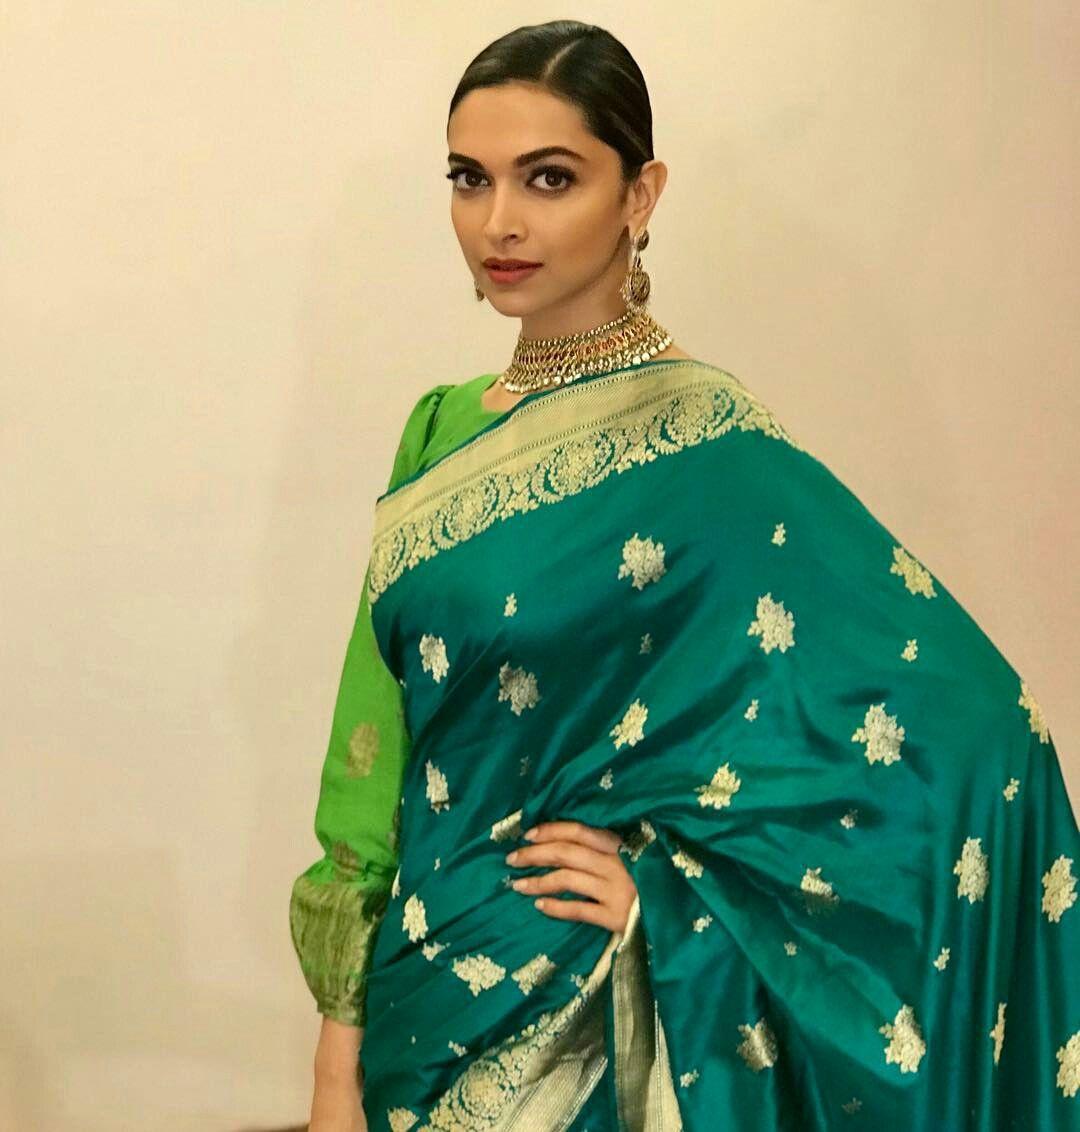 From Banarasi Saree To Designer Saree: How Aishwarya Rai Bachchan, Kareena Kapoor, And Deepika Padukone look extremely stylish for festive eve 8